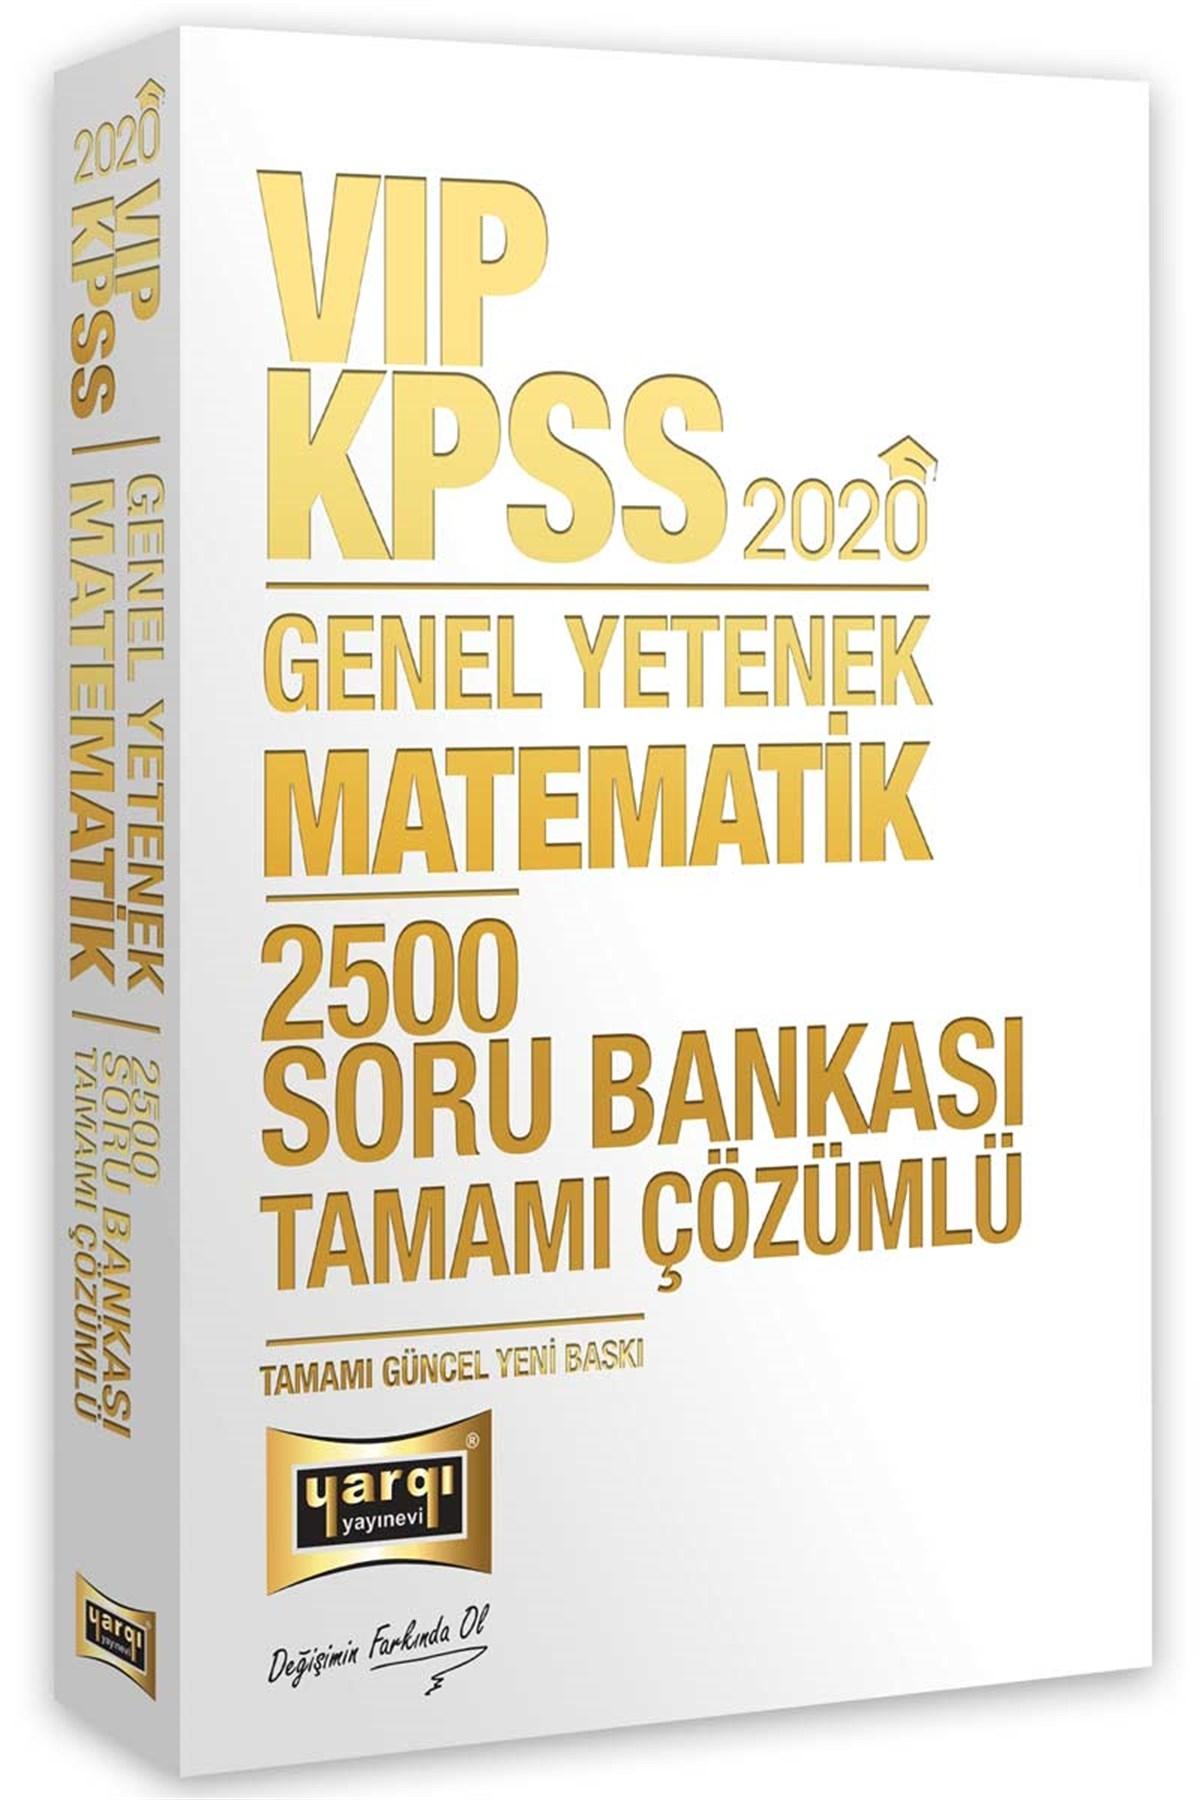 2020 KPSS VIP MATEMATİK TAMAMI ÇÖZÜMLÜ 2500 SORU BANKASI ( 2020 KPSS VIP MATEMATİK TAMAMI ÇÖZÜMLÜ 2500 SORU BANKASI )